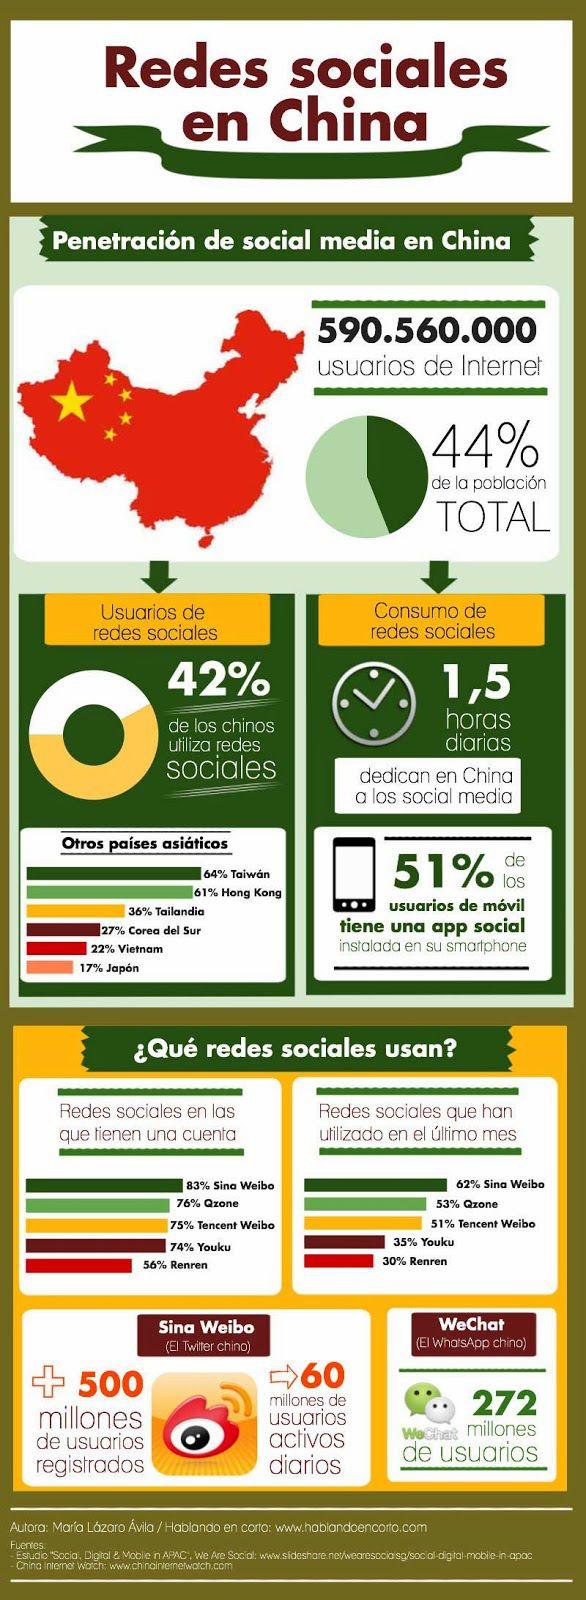 Redes Sociales en China #infografia #infographic #socialmedia